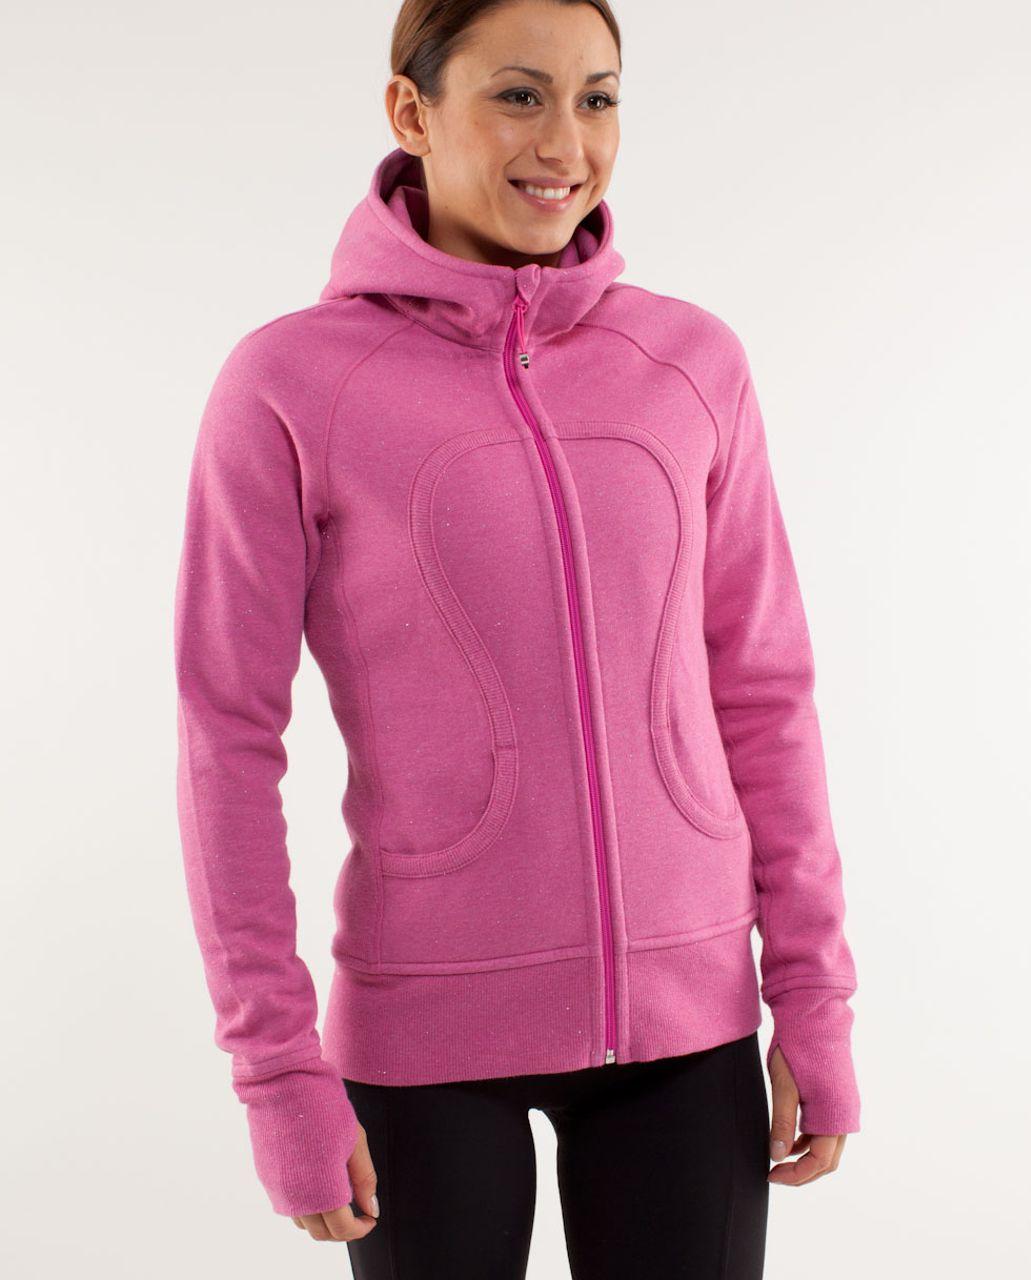 Lululemon Scuba Hoodie *Sparkle - Heathered Paris Pink /  Paris Pink